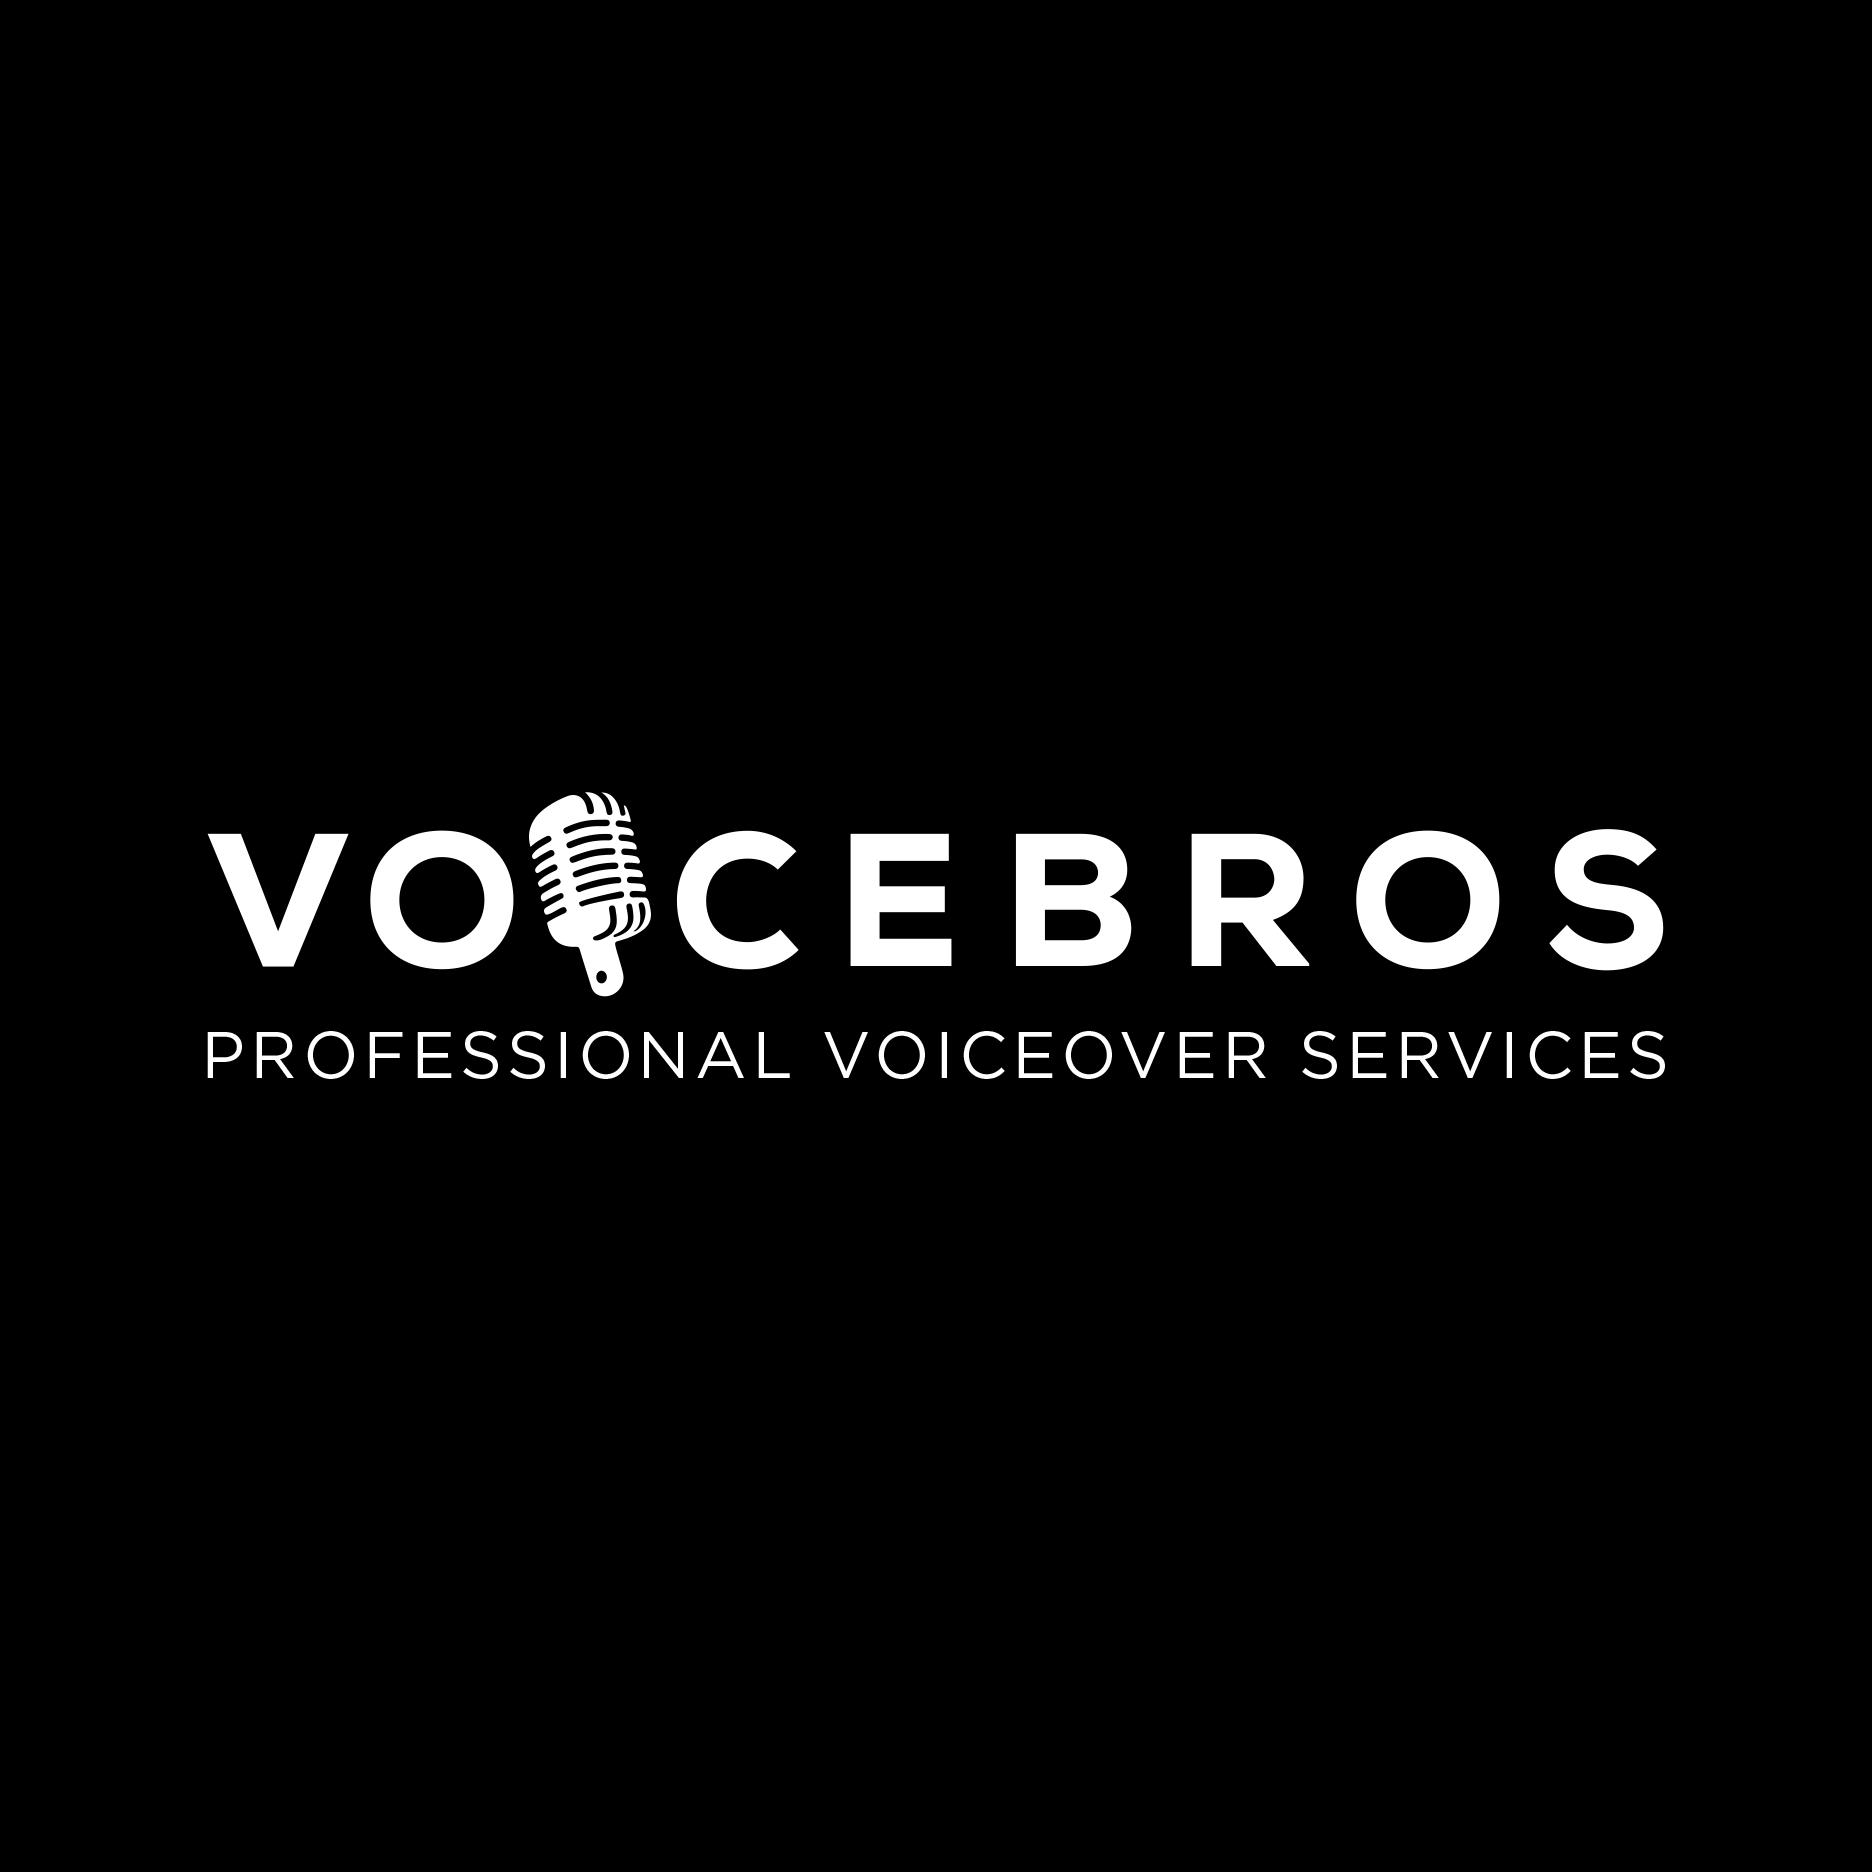 Vitor Augusto Pina da Silva is a voice over actor